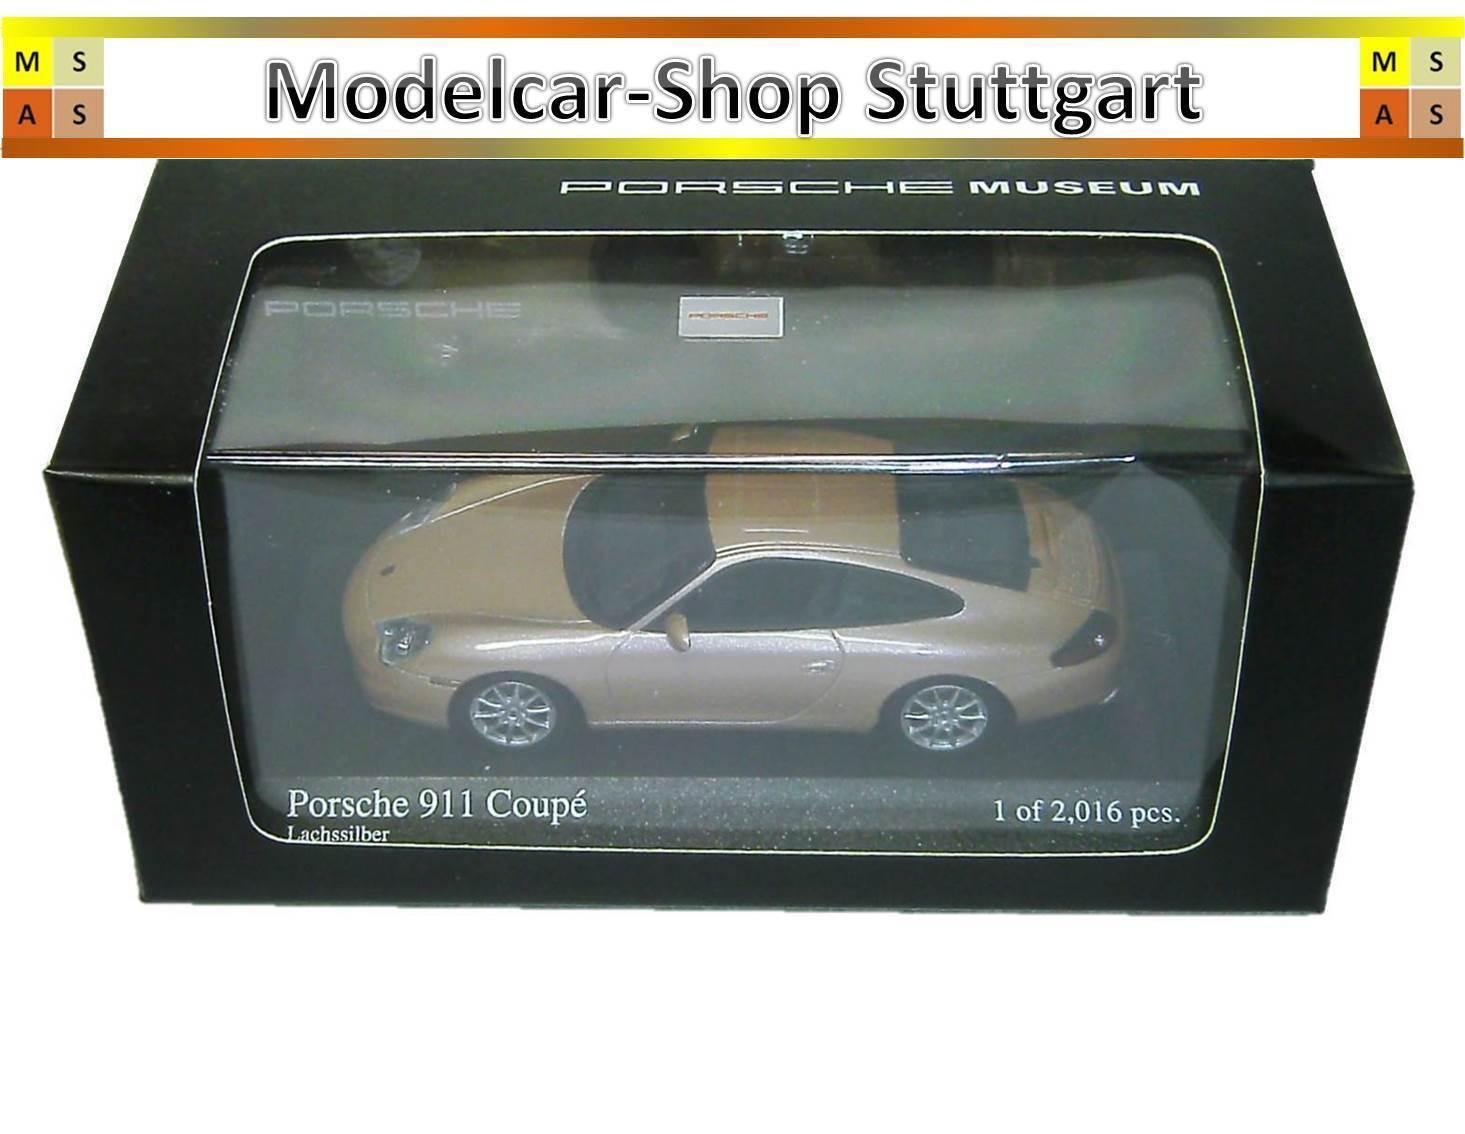 Porsche 911 Coupé Lachssilber Museum Edition Minichamps 1 43 neu  | Good Design